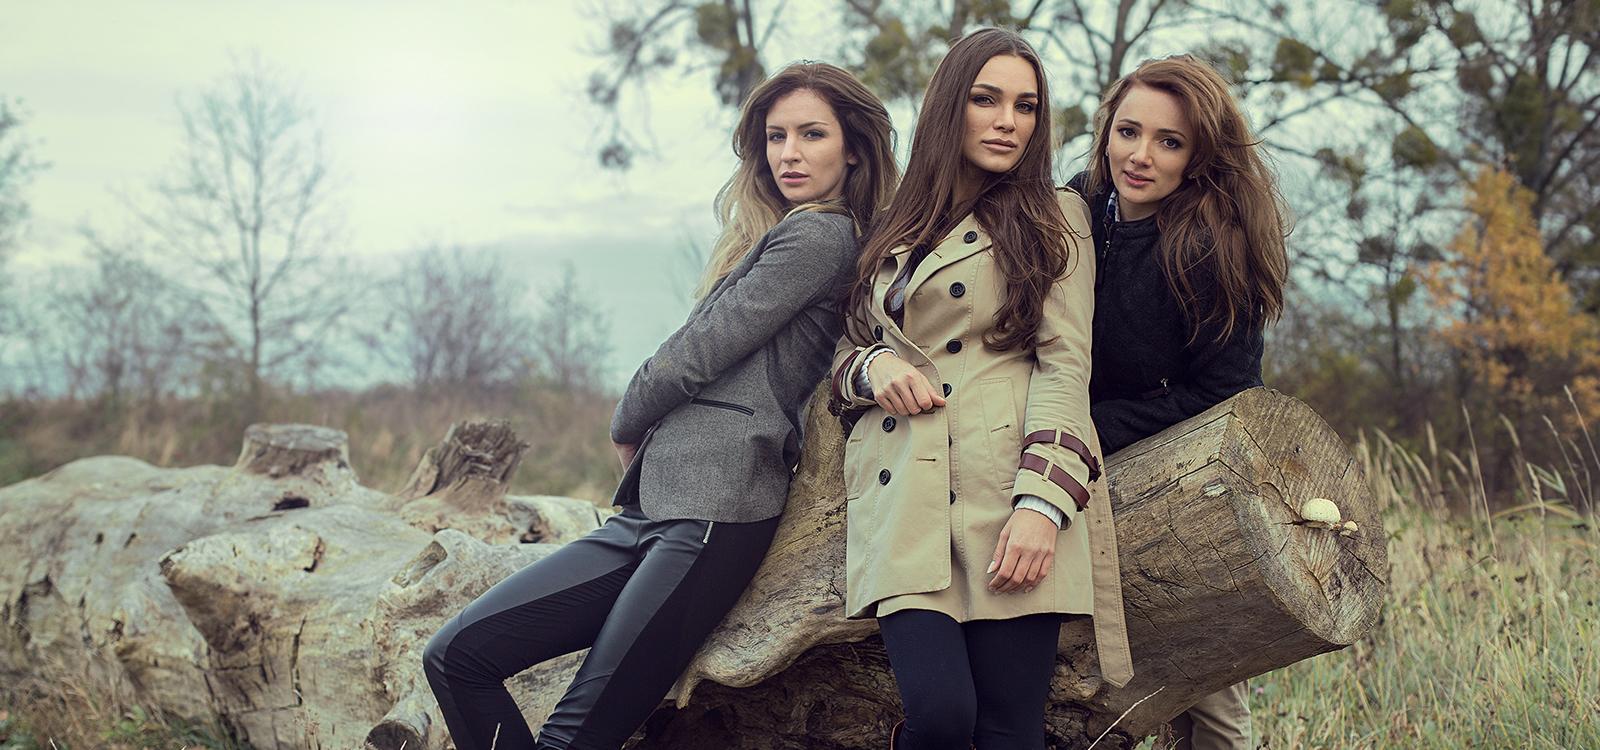 Tree women posing